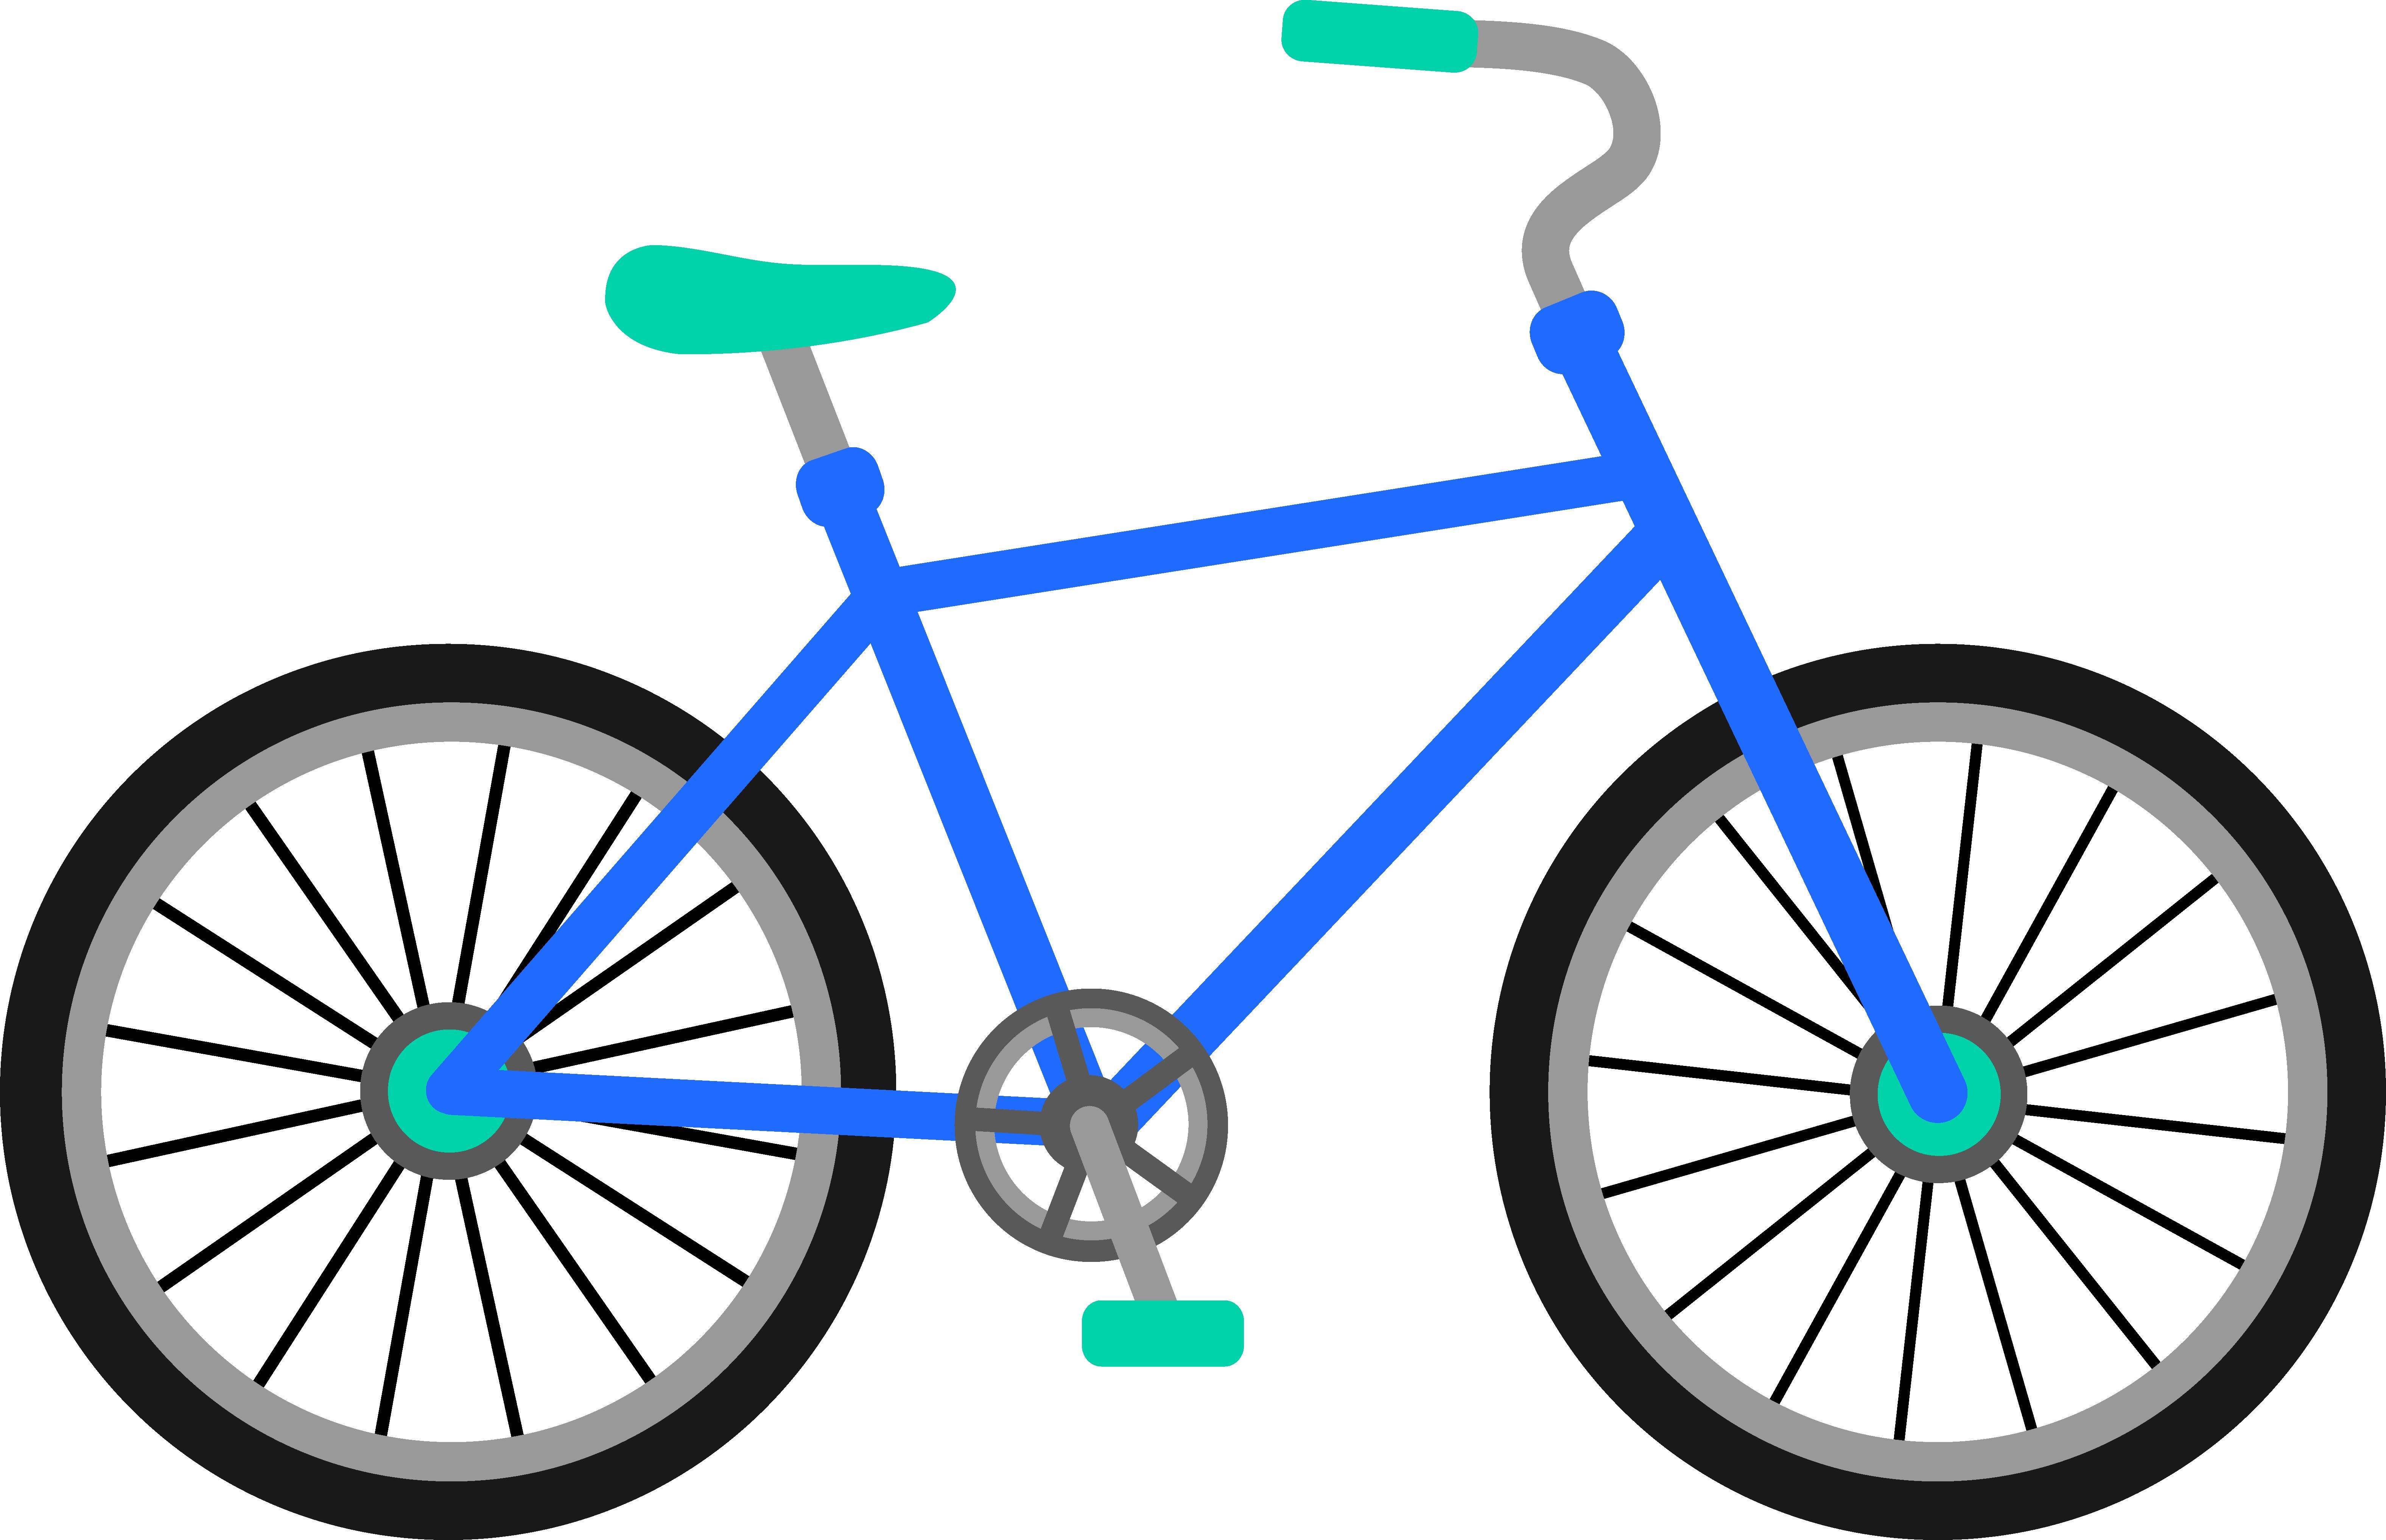 Bobs Bike Ride 2017